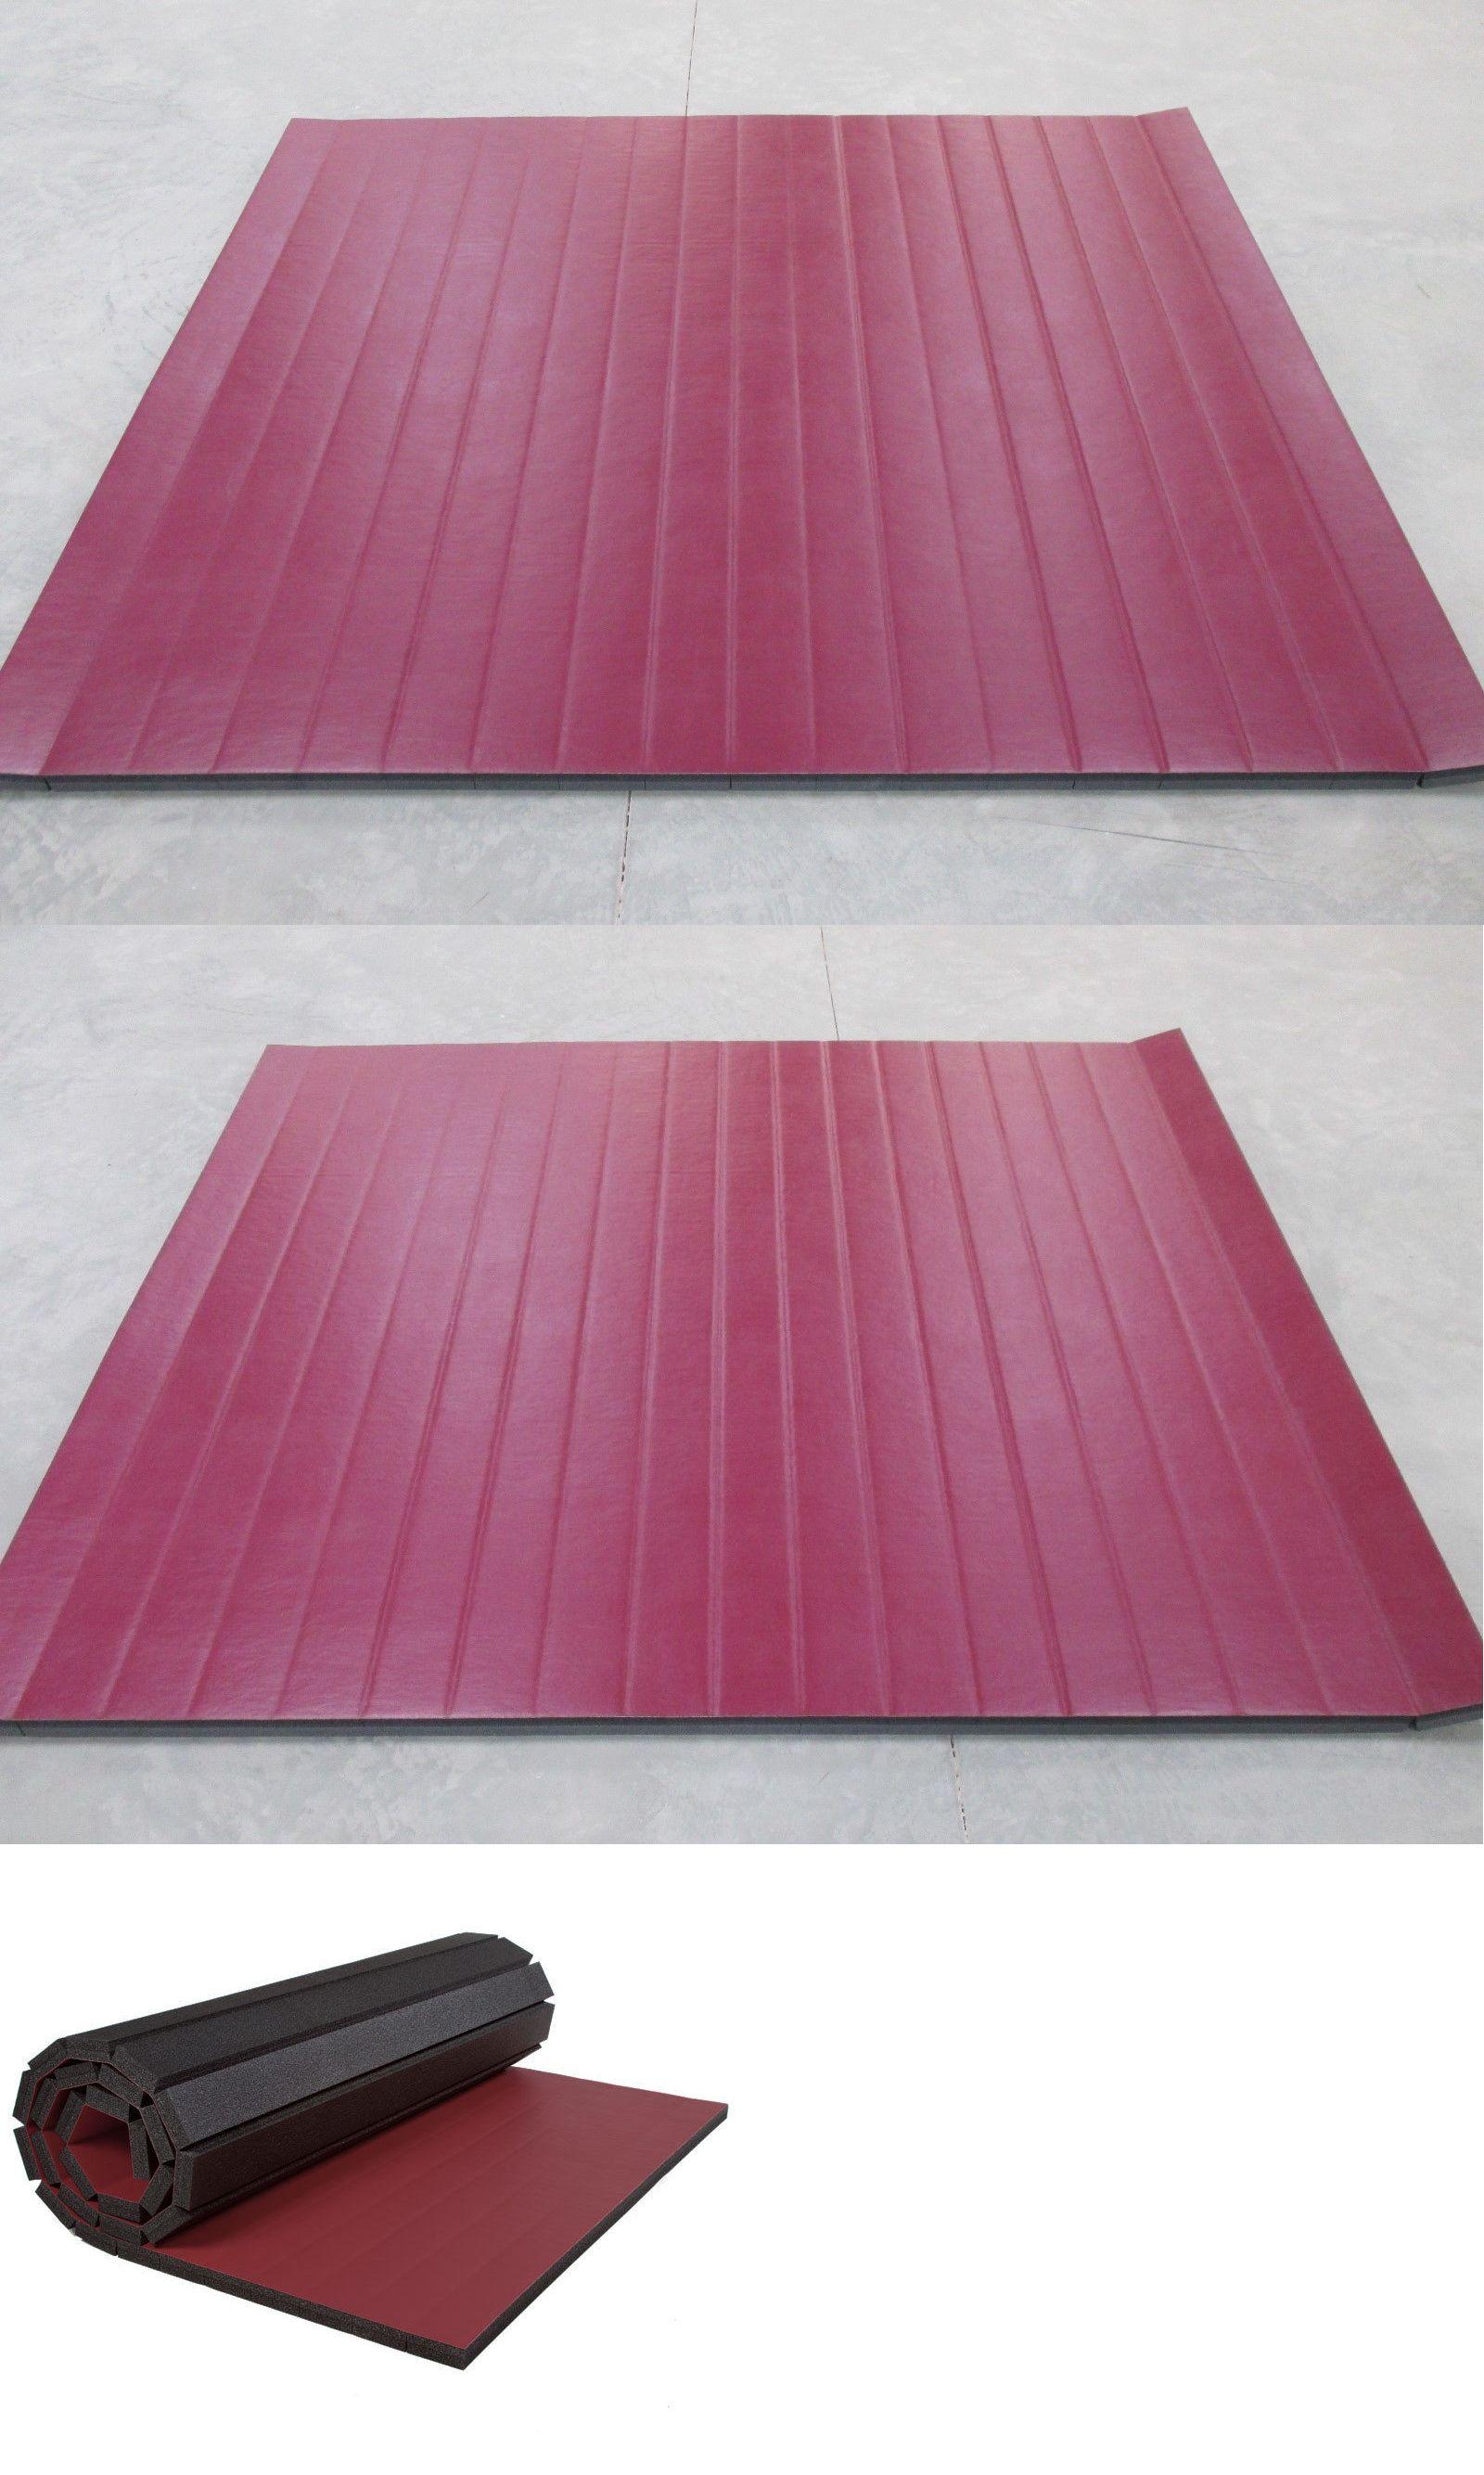 crash wrestling gym range product for cheap number matting mats uk mat promat category sale supplier web